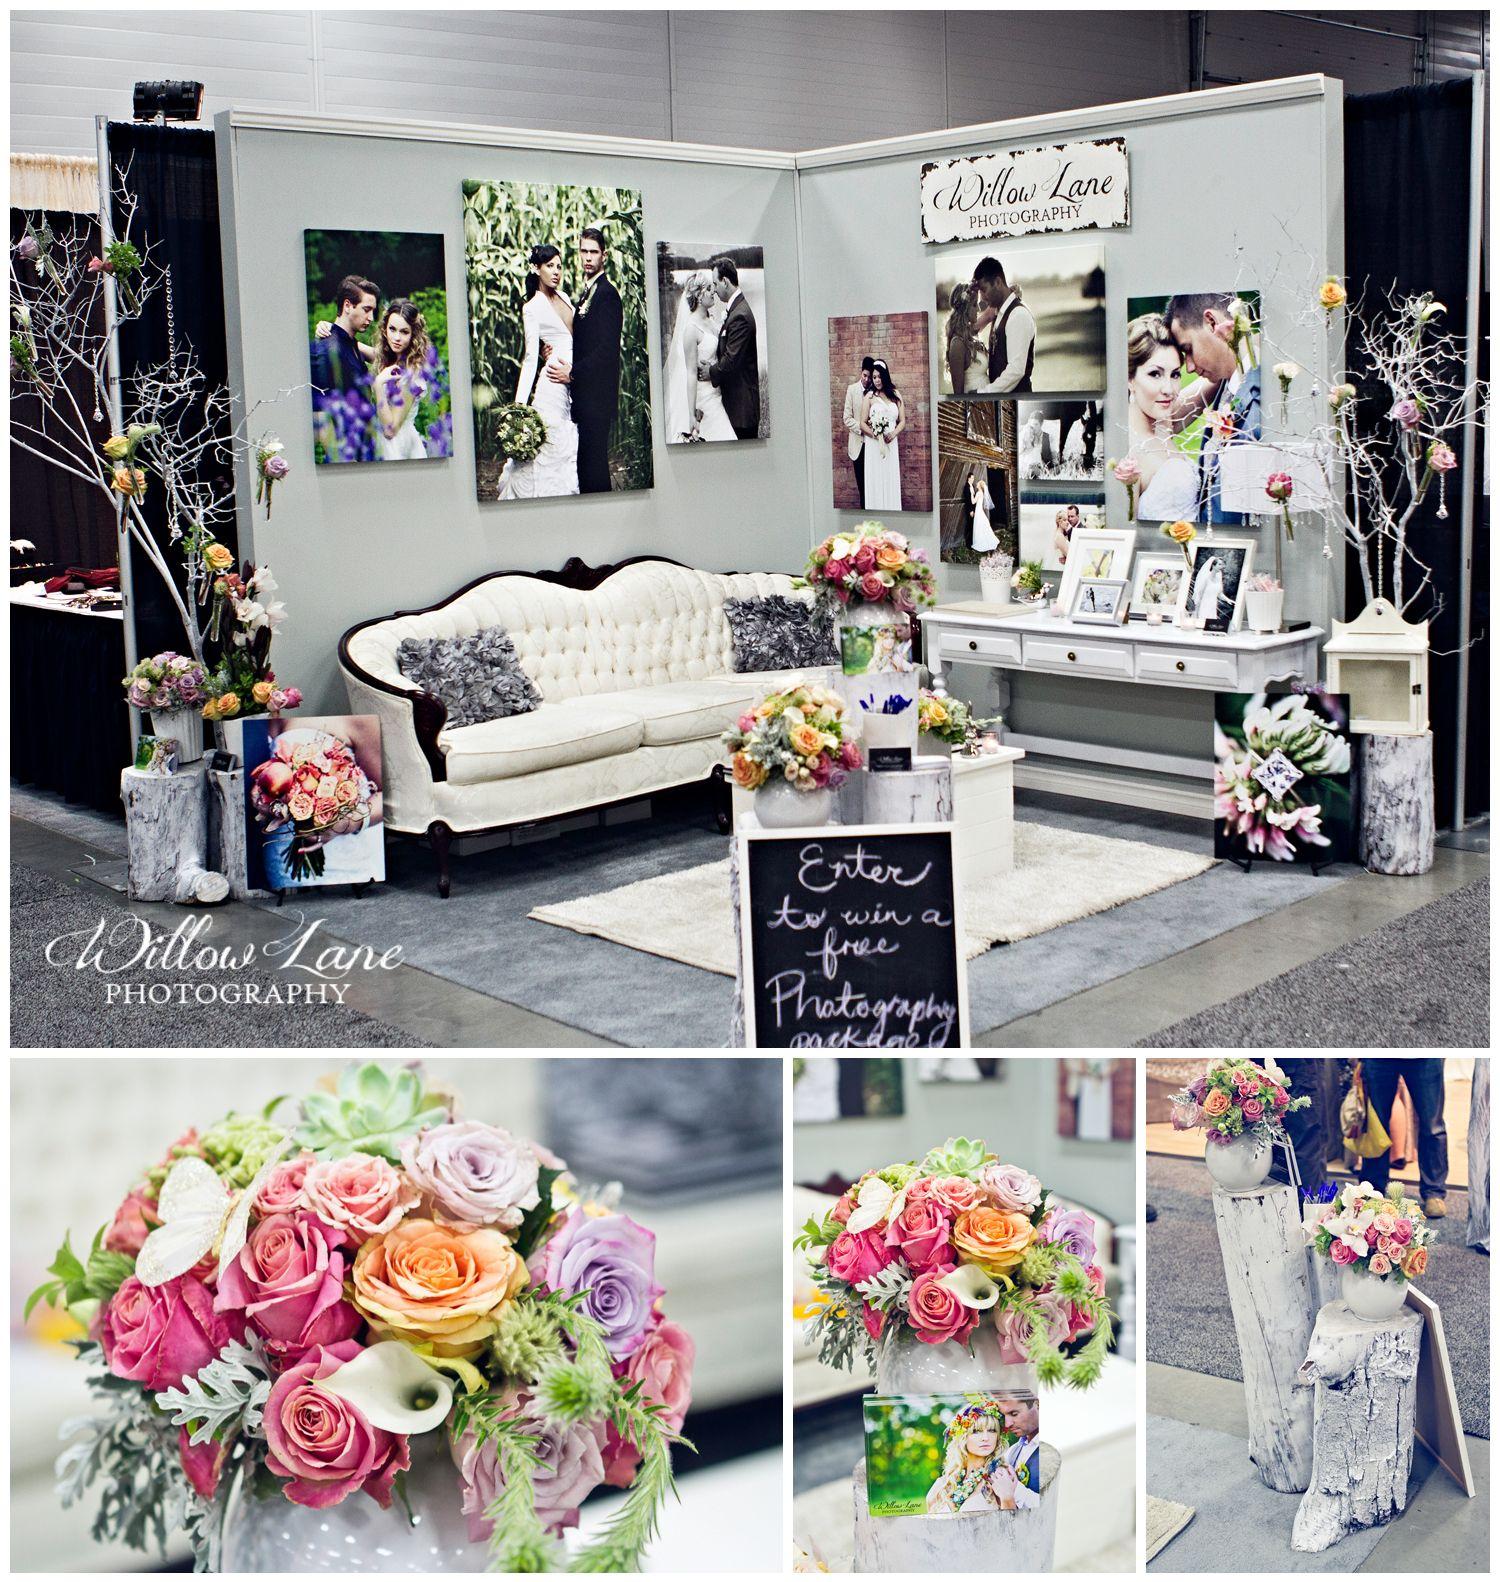 Trade Show Booth Edmonton : Willow lane photography edmonton ab bridal show booth